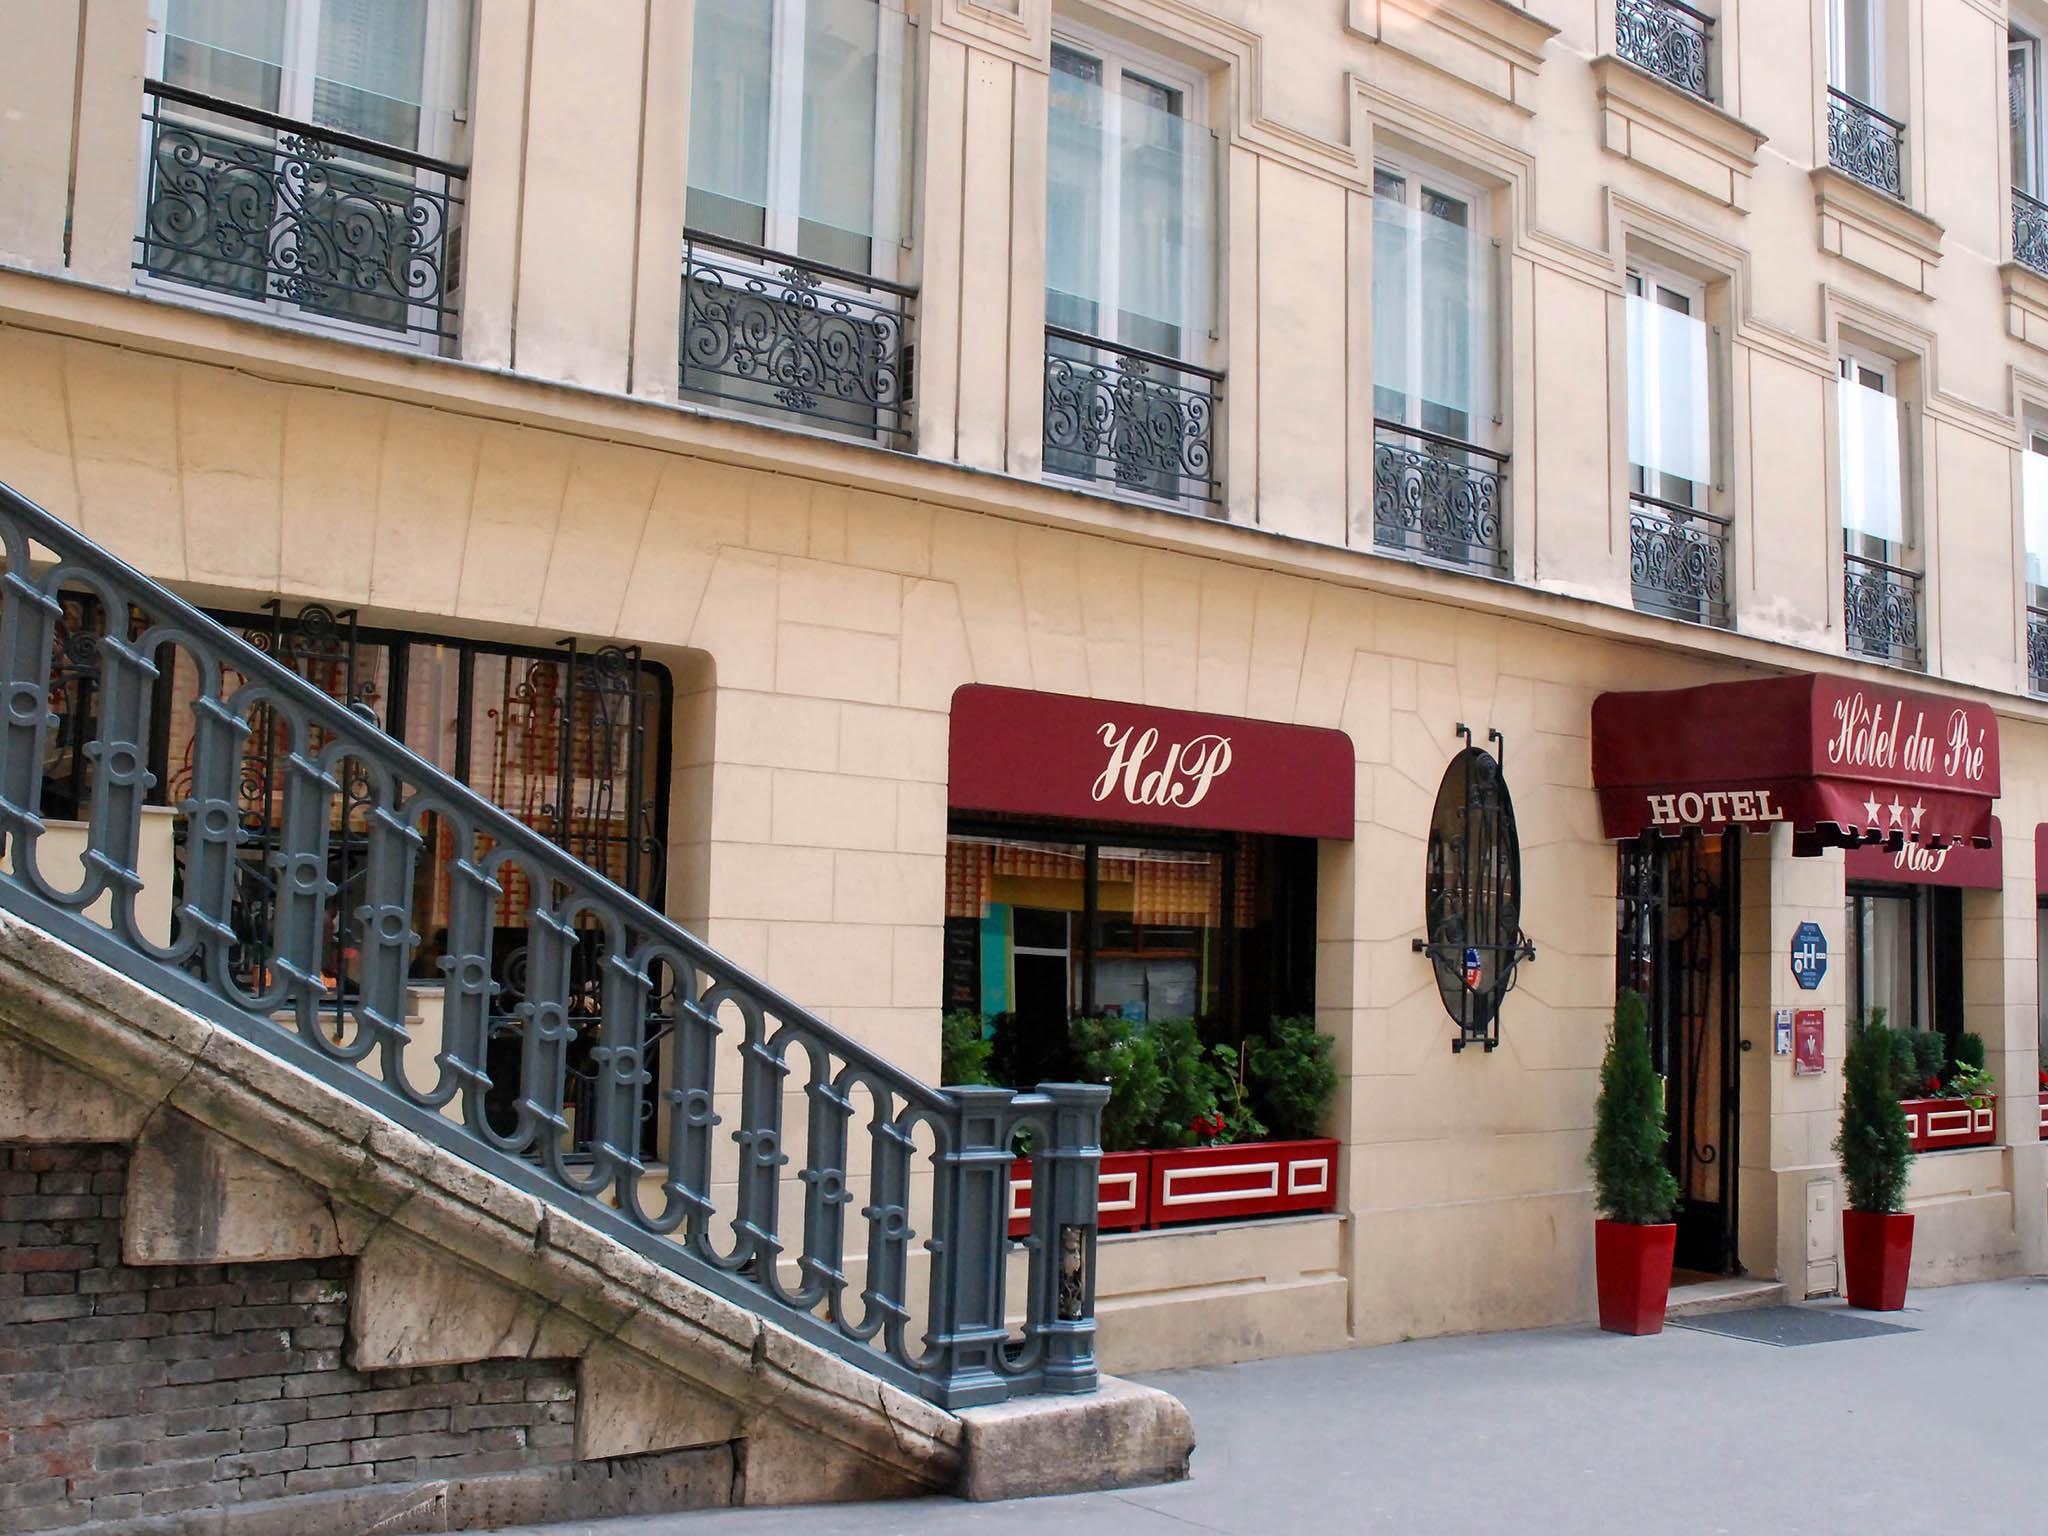 hotel in paris hotel du pre. Black Bedroom Furniture Sets. Home Design Ideas